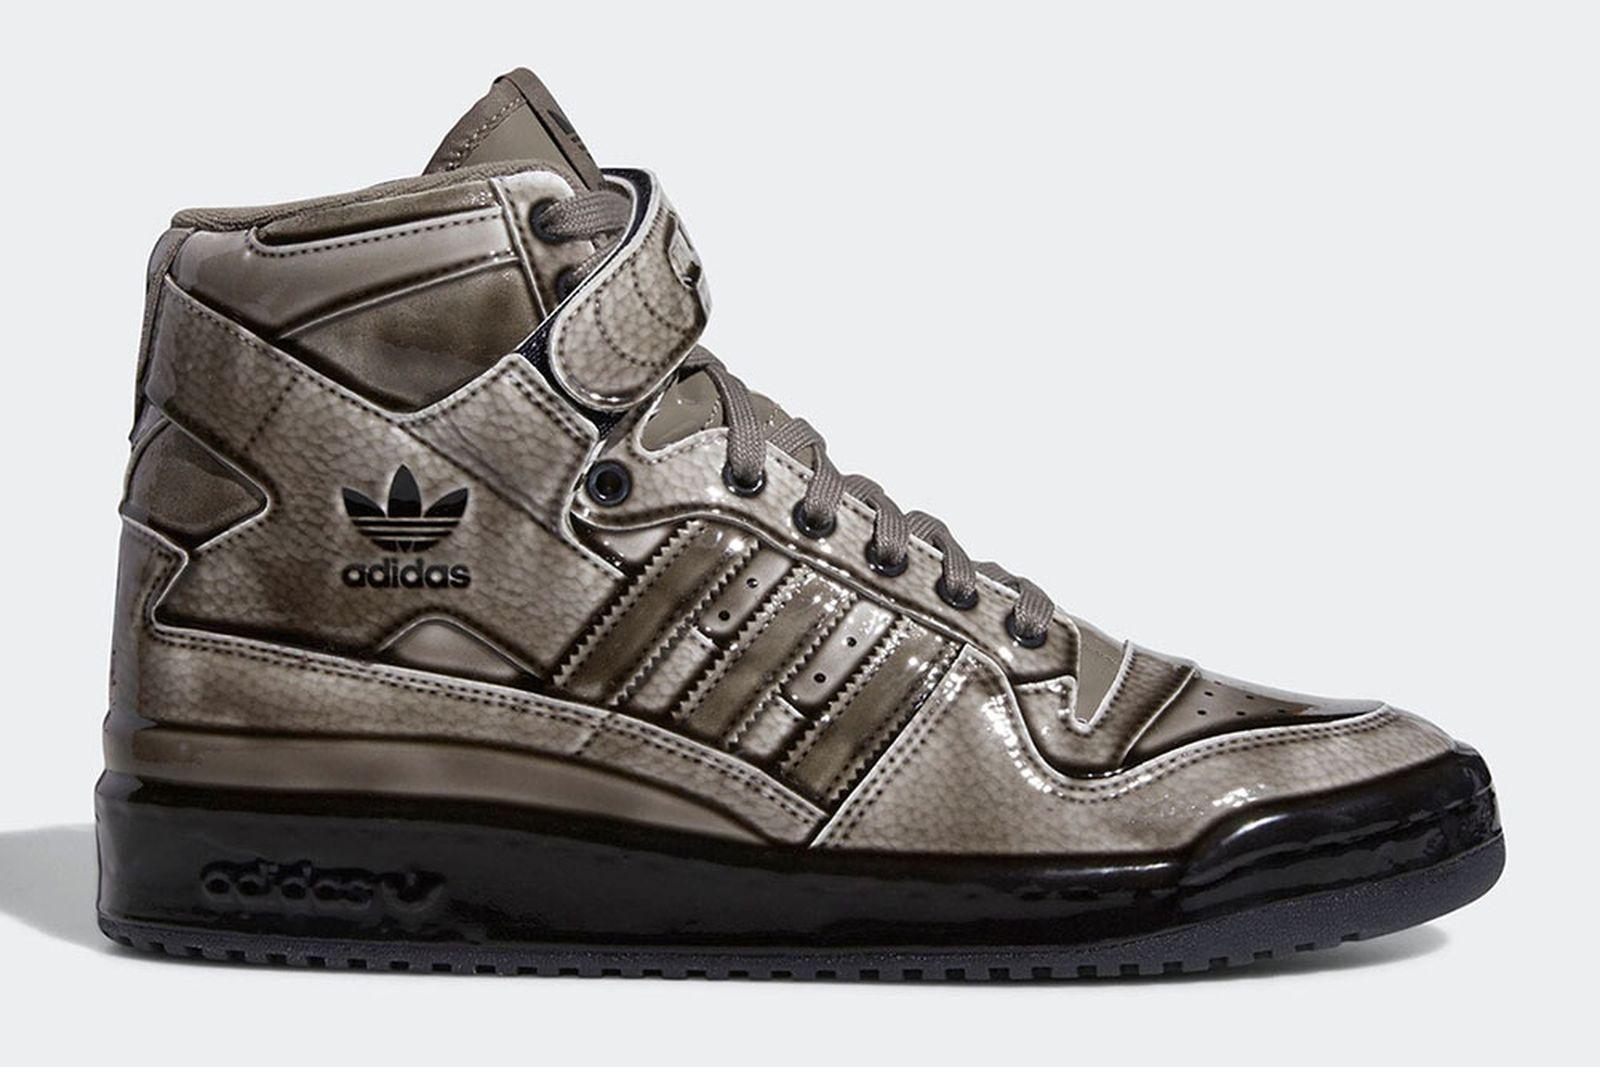 jeremy-scott-adidas-forum-hi-release-date-price-04